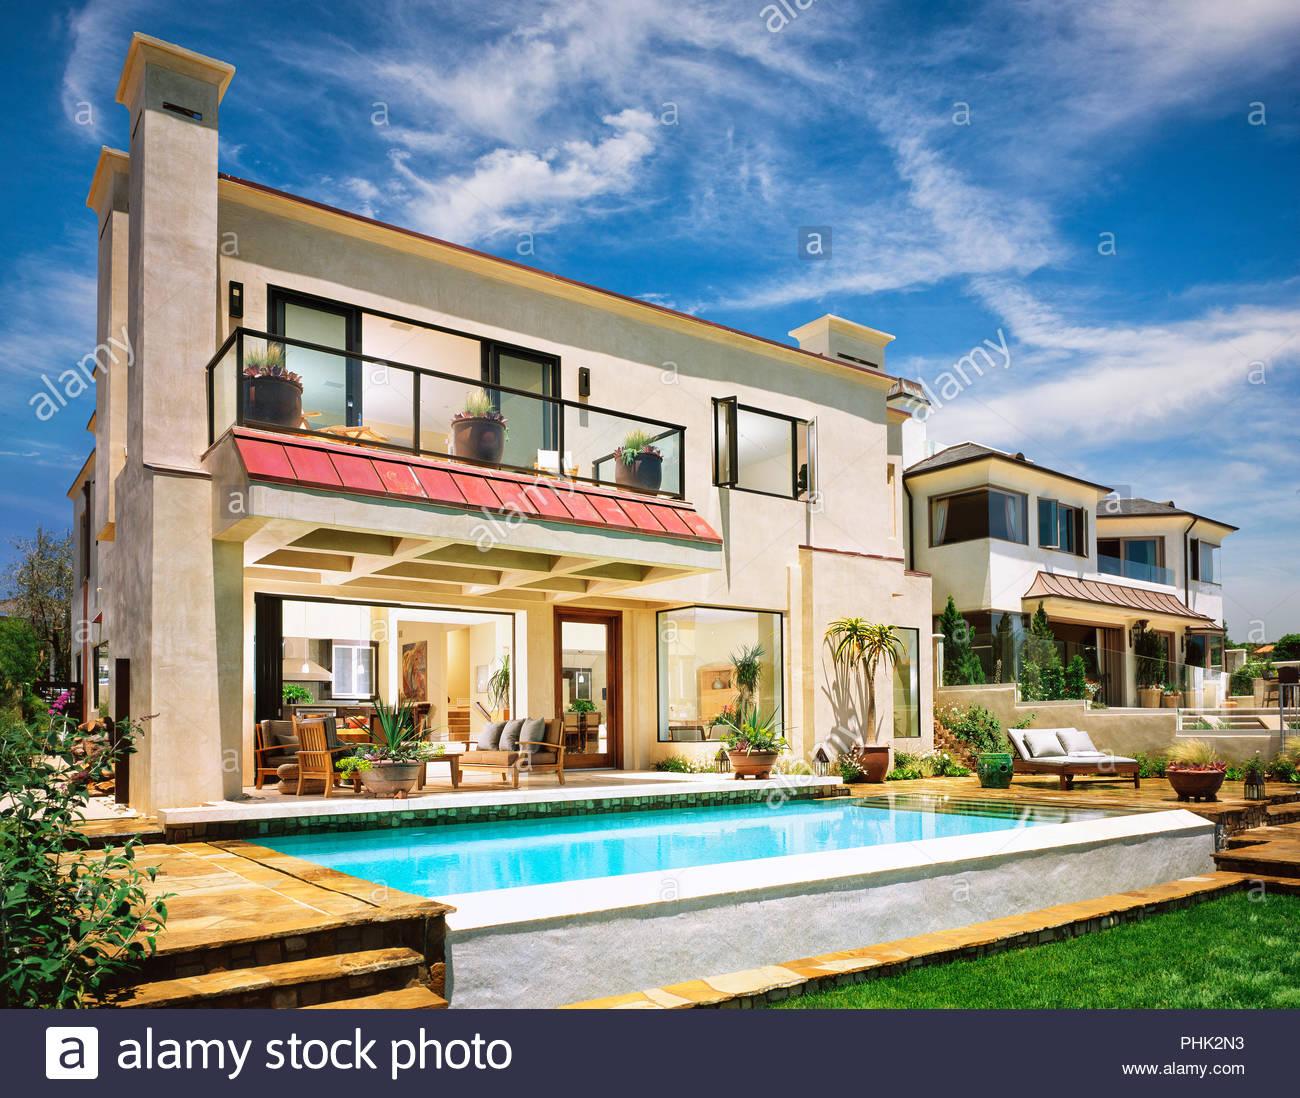 Maison avec piscine Photo Stock